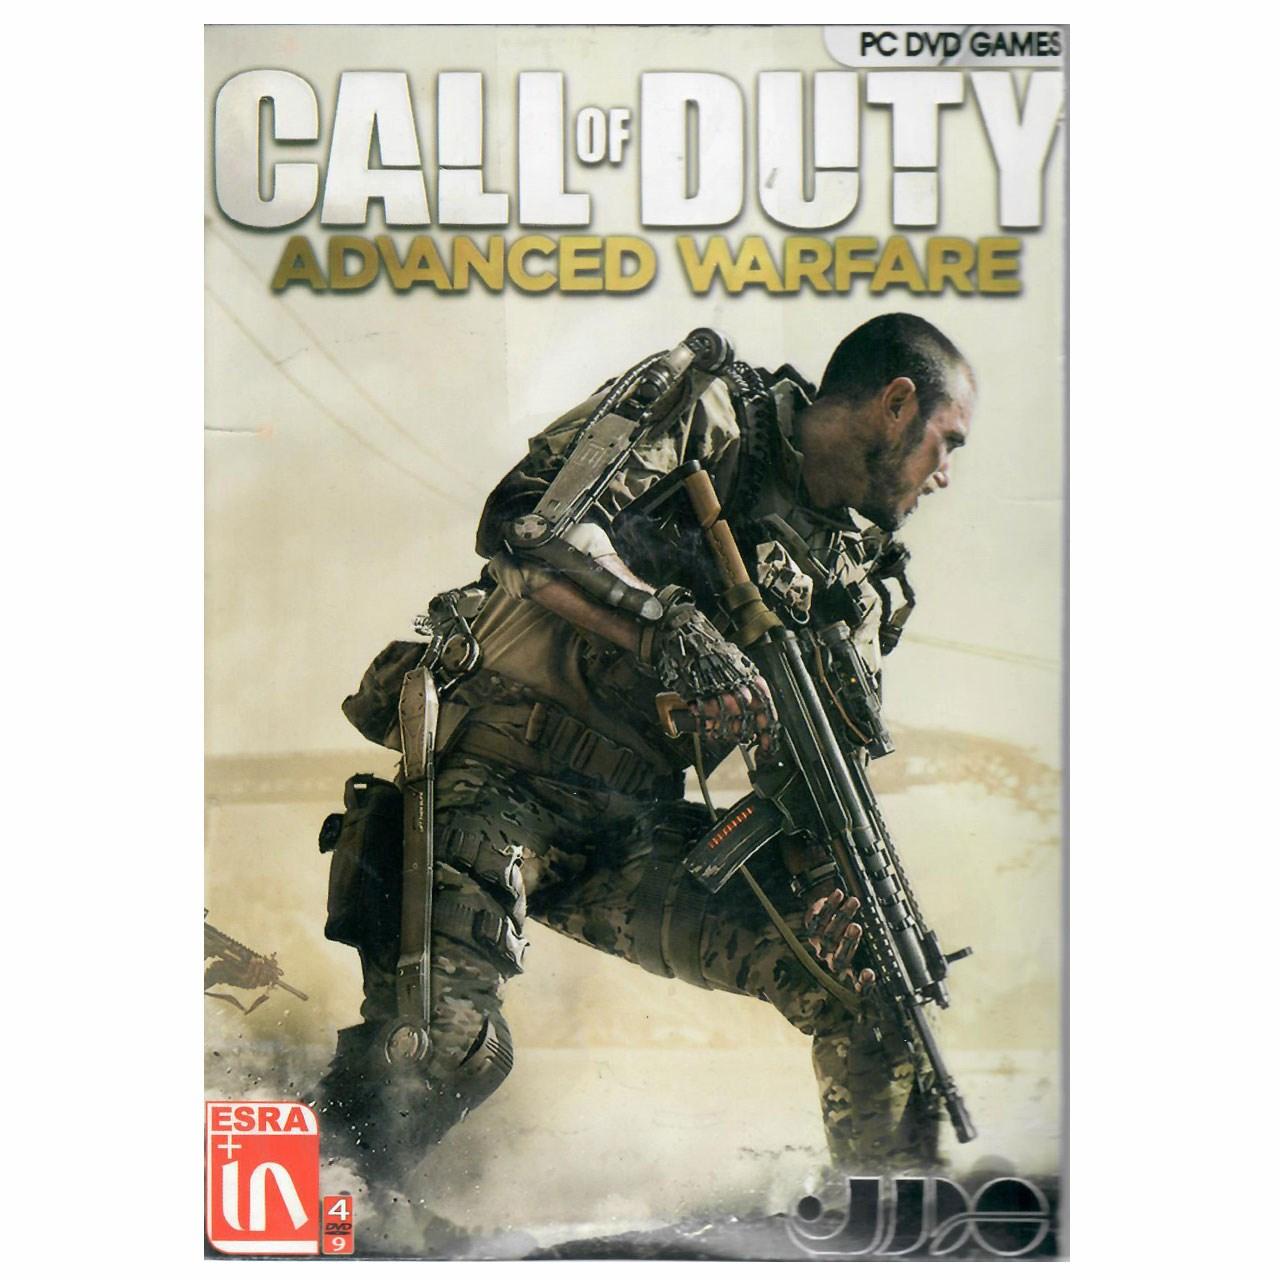 بازی کامپیوتری Call of Duty Advanced Warfare مخصوص PC